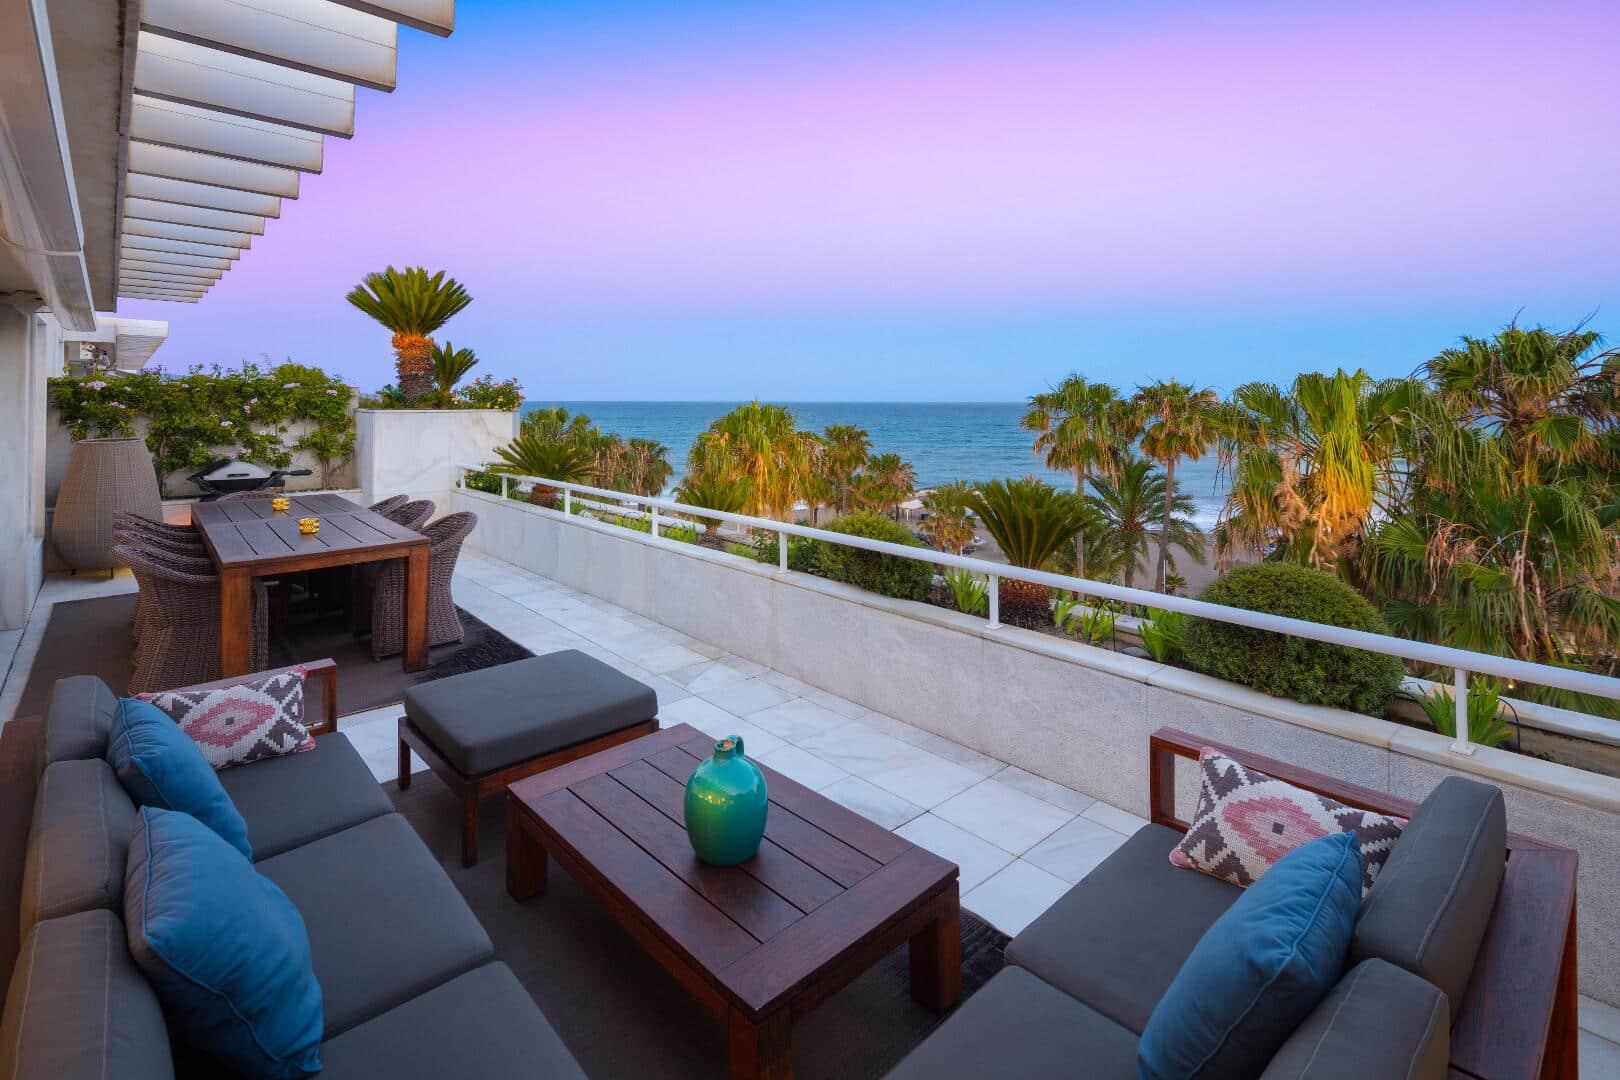 Duplex penthouse apartment with private pool in los Granados, Puerto Banus Marbella